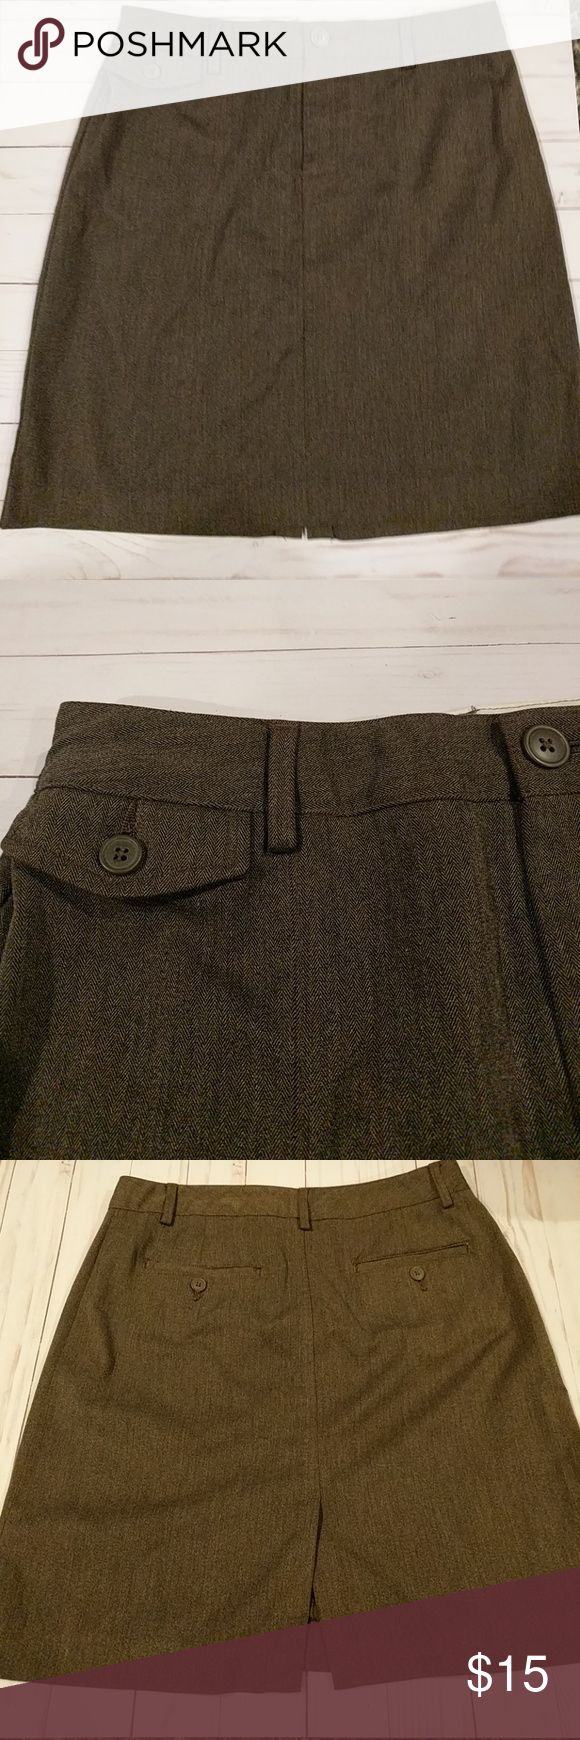 Old Navy Skirt Old Navy Skirt, brown with back pocket design and belt loops I Old Navy Skirts